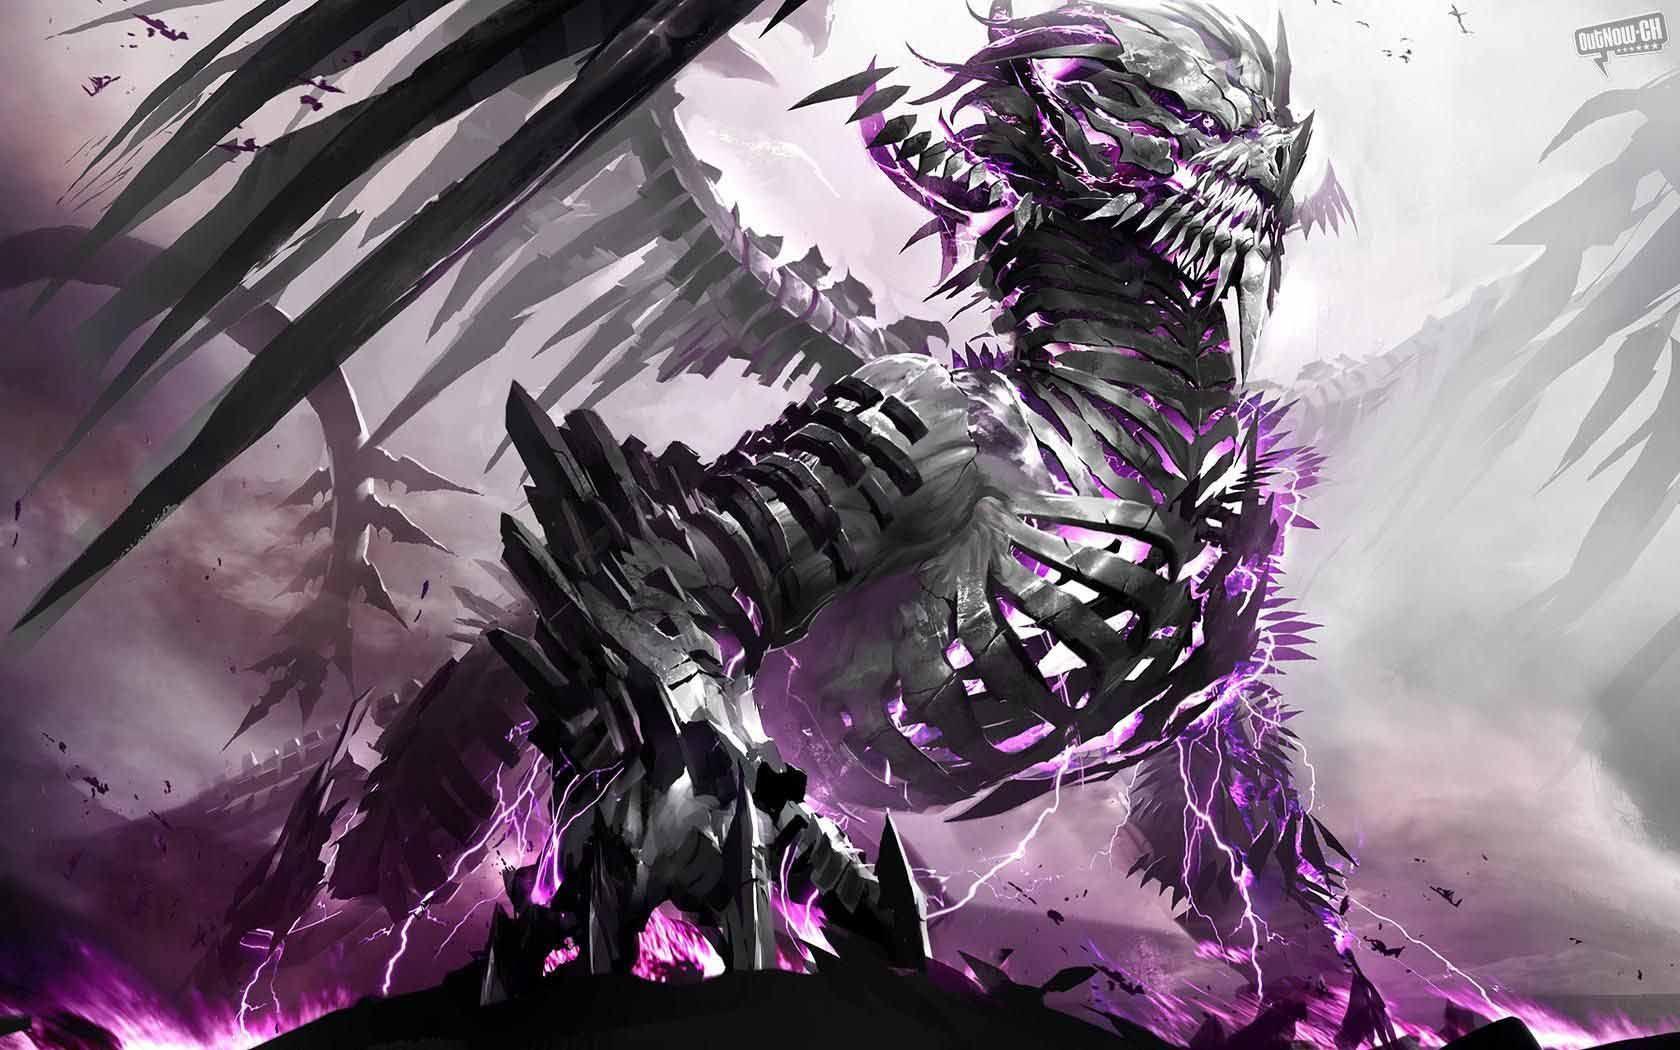 Dragon Wallpapers 1080p Wallpaper Cave In 2019 Dragon